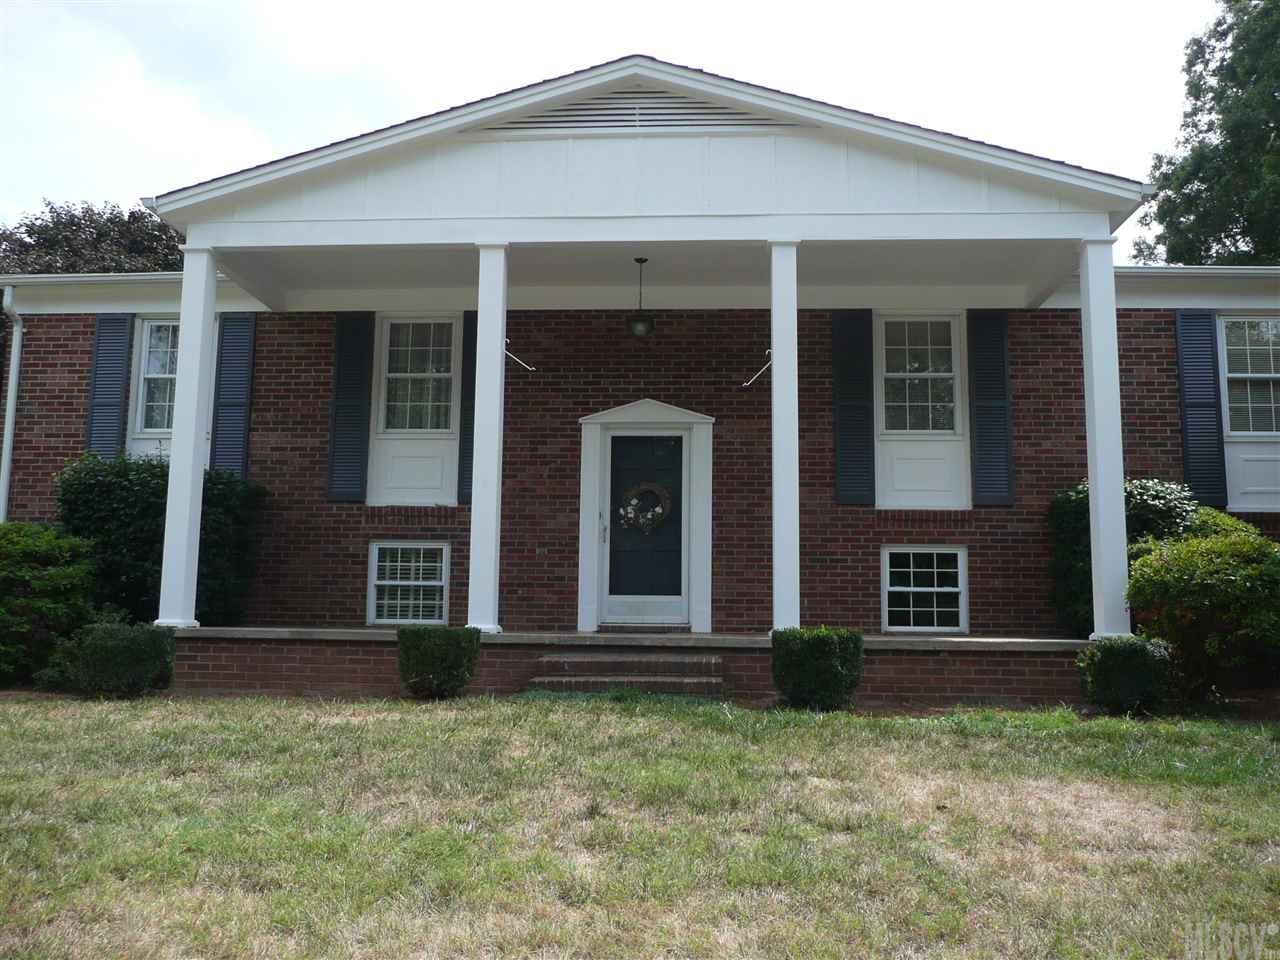 Real Estate for Sale, ListingId: 35163413, Hickory,NC28602